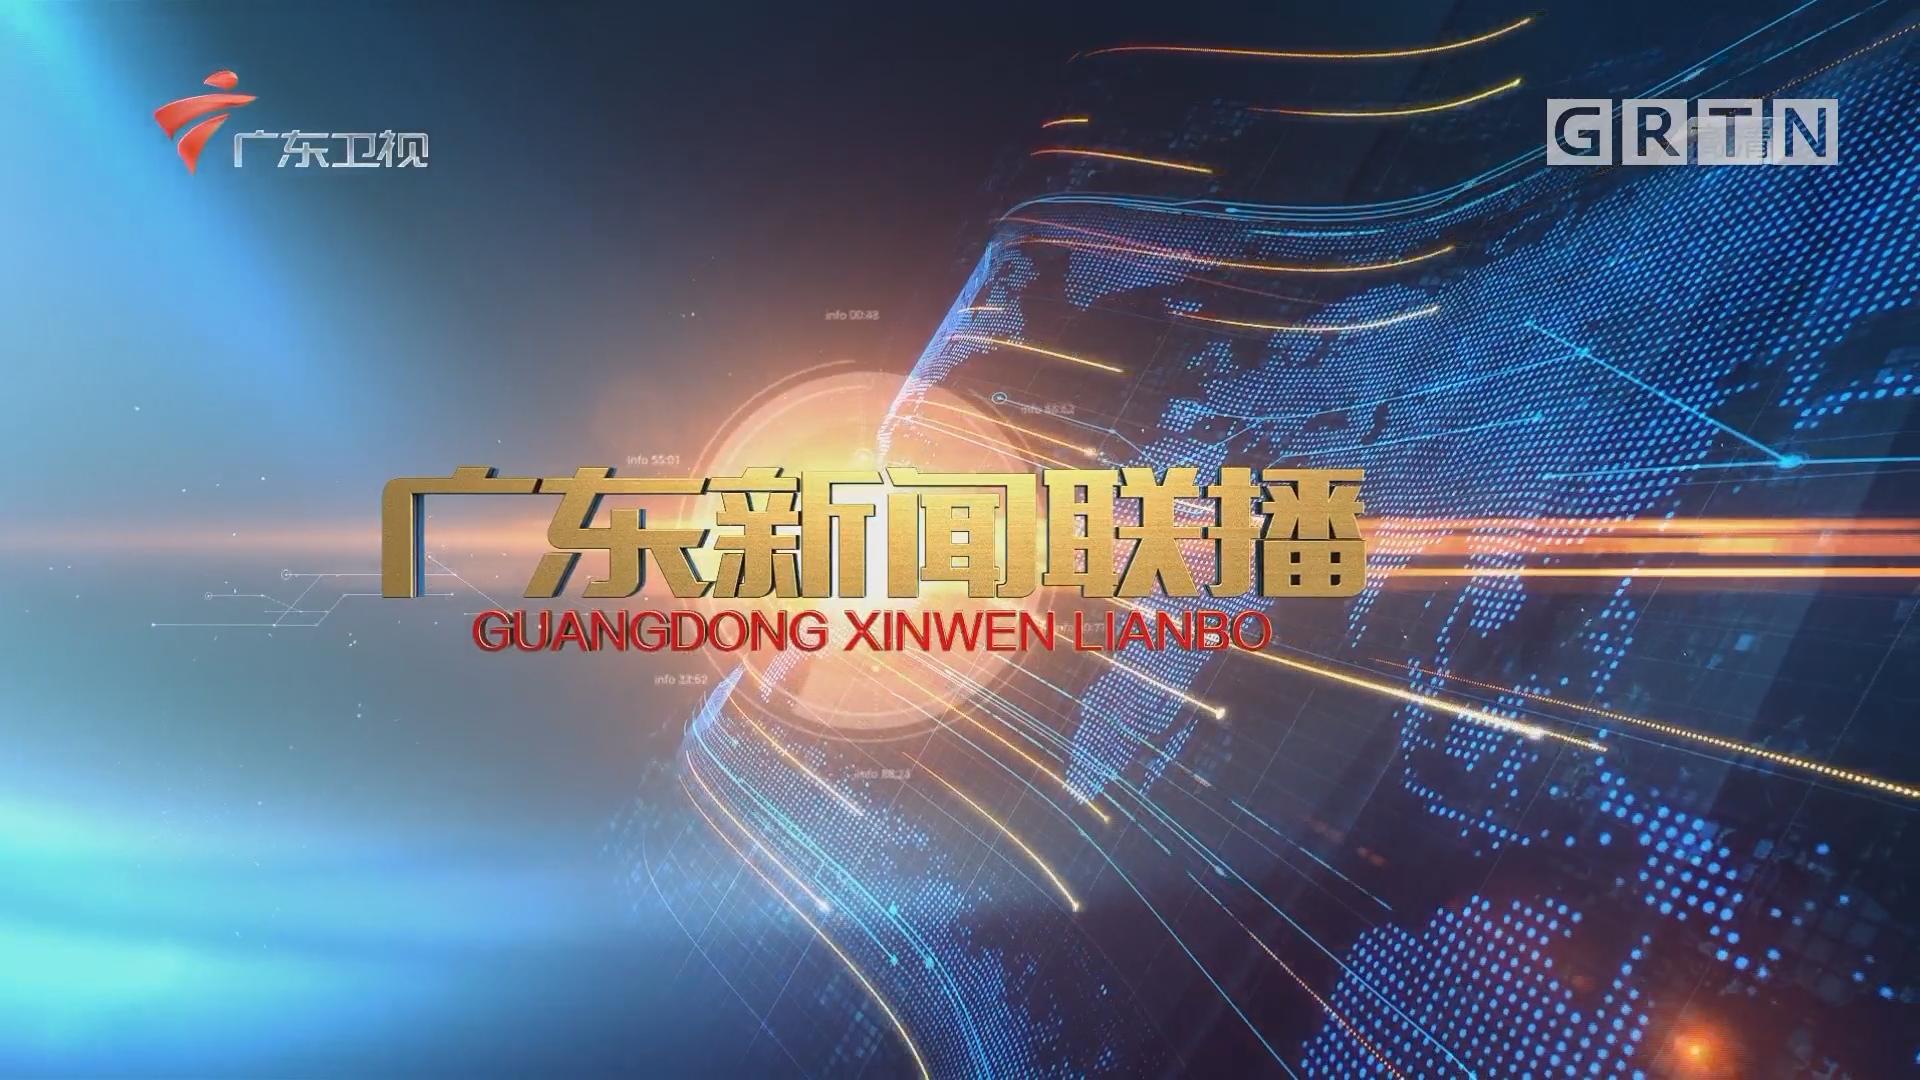 [HD][2018-03-17]广东新闻联播:十三届全国人大一次会议举行第五次全体会议 选举产生新一届国家领导人